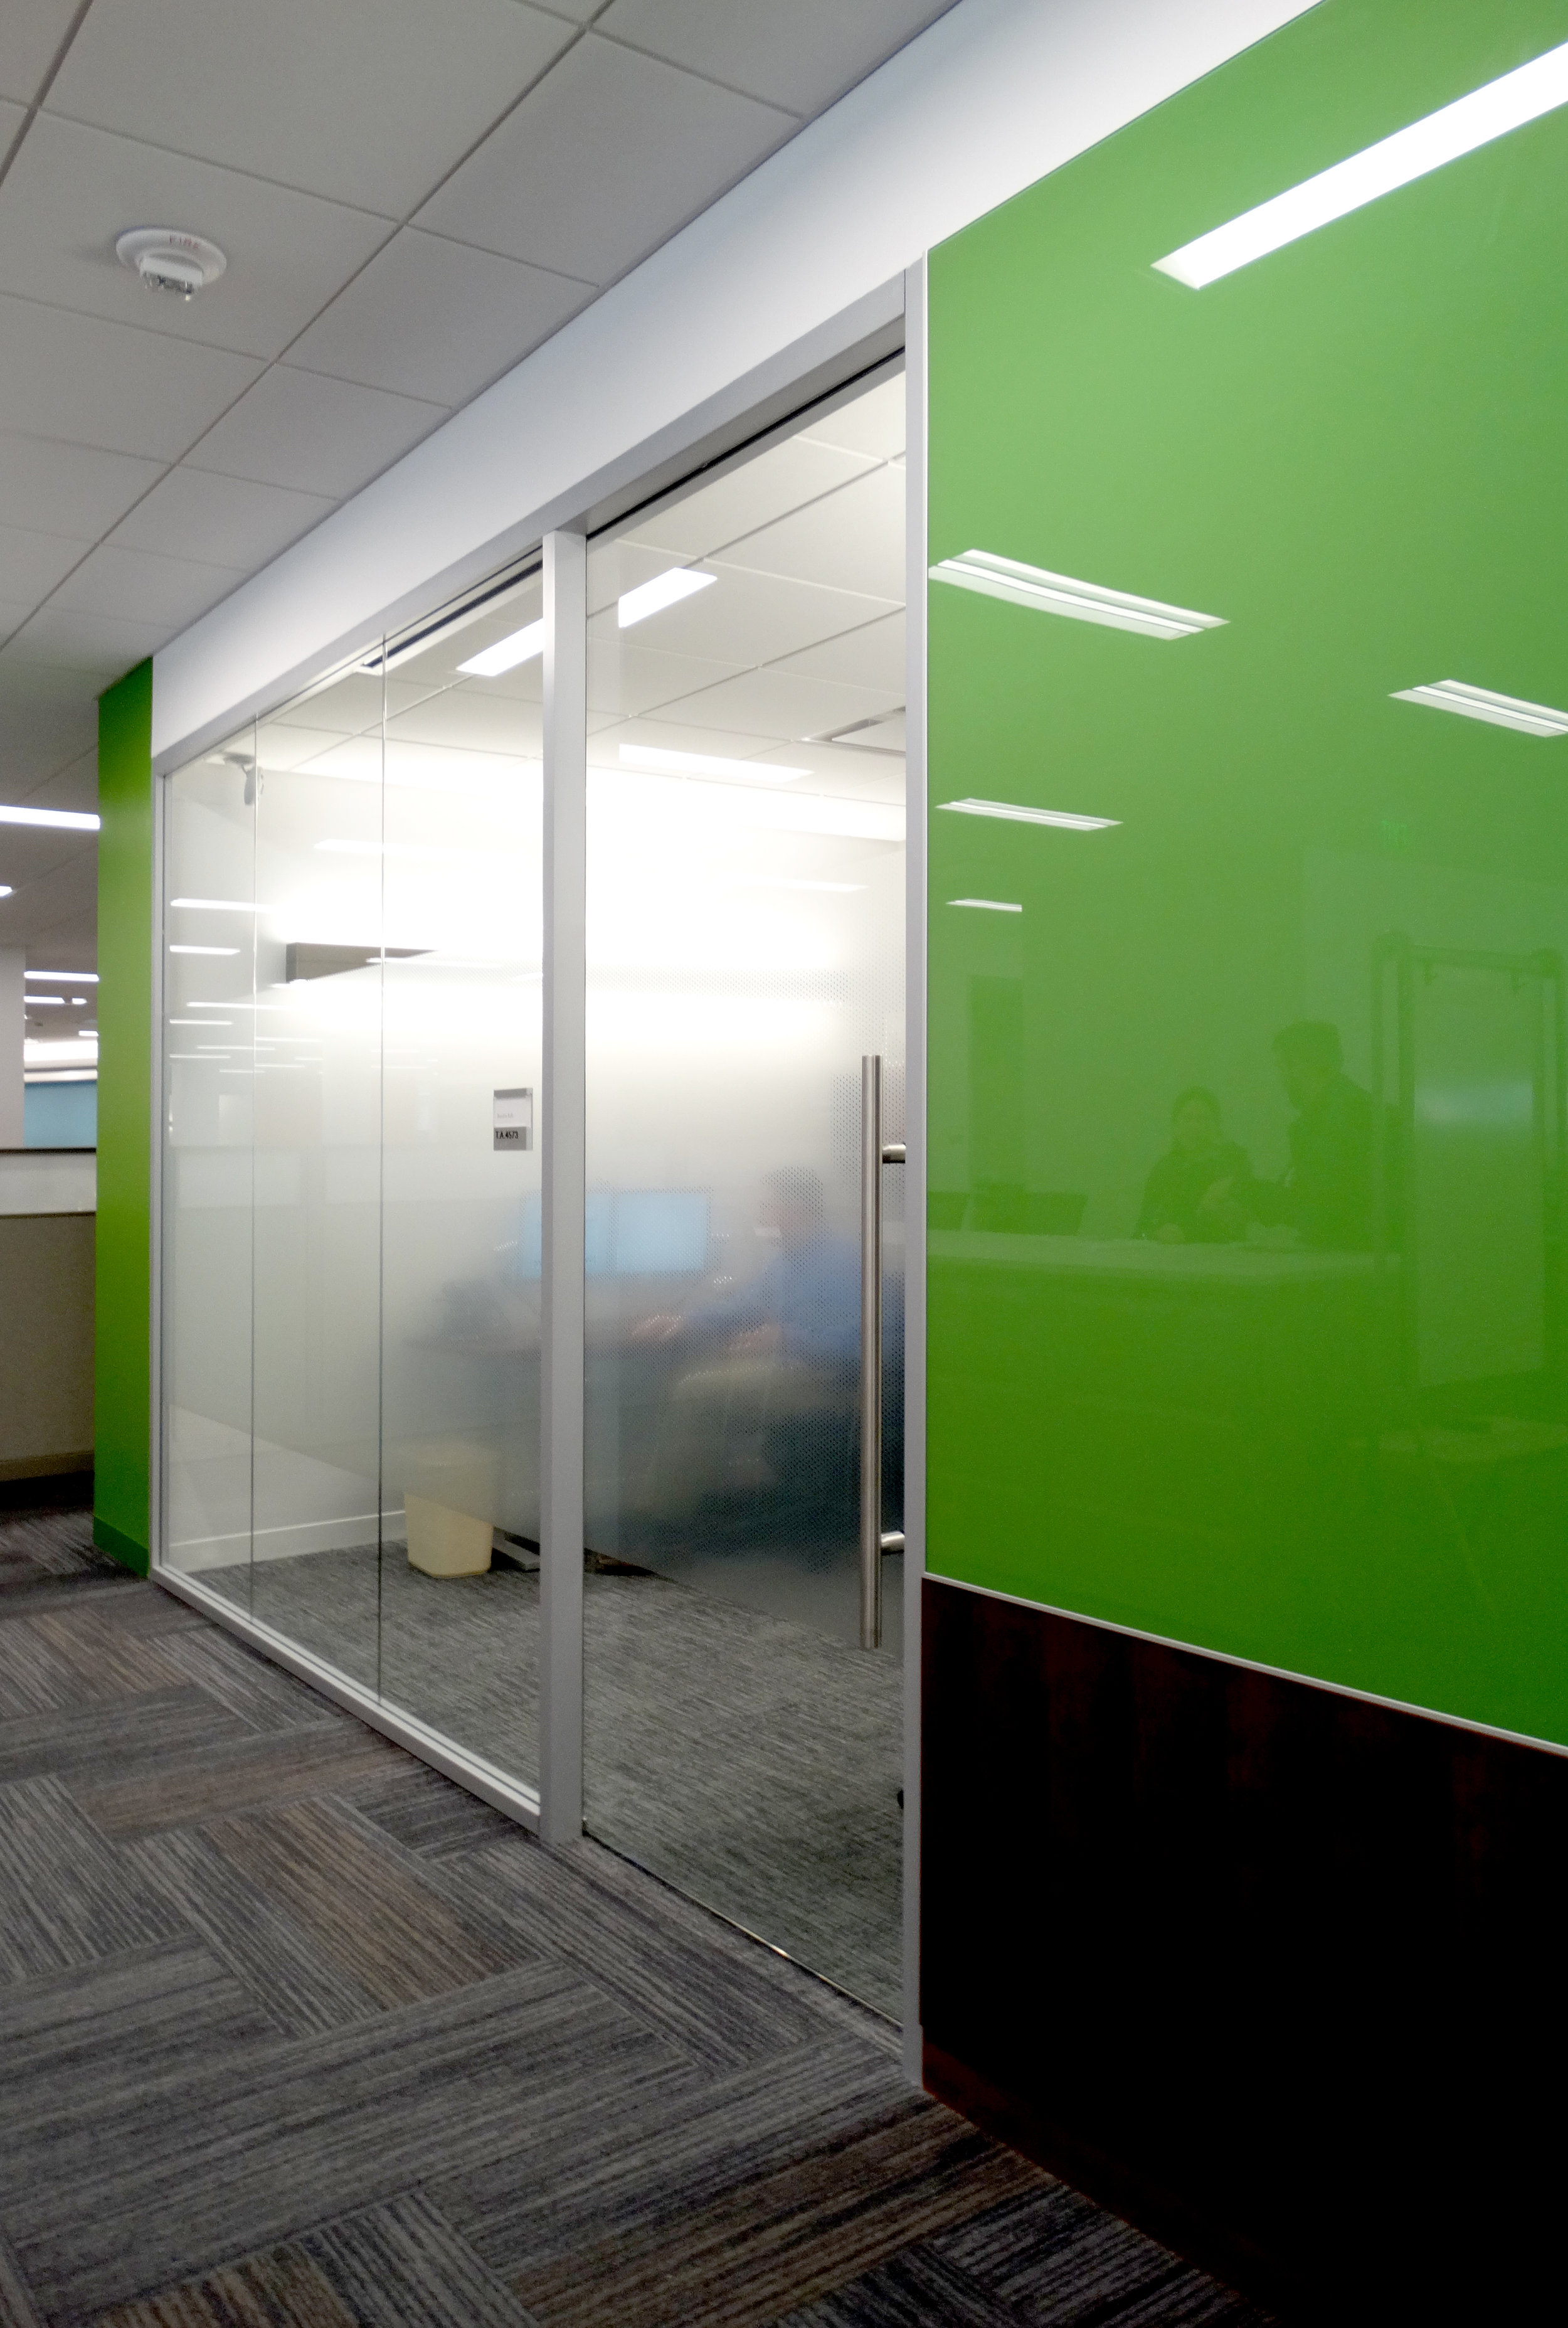 Green Glass Millwork Marker Board Office Wall - Spaceworks AI.jpg